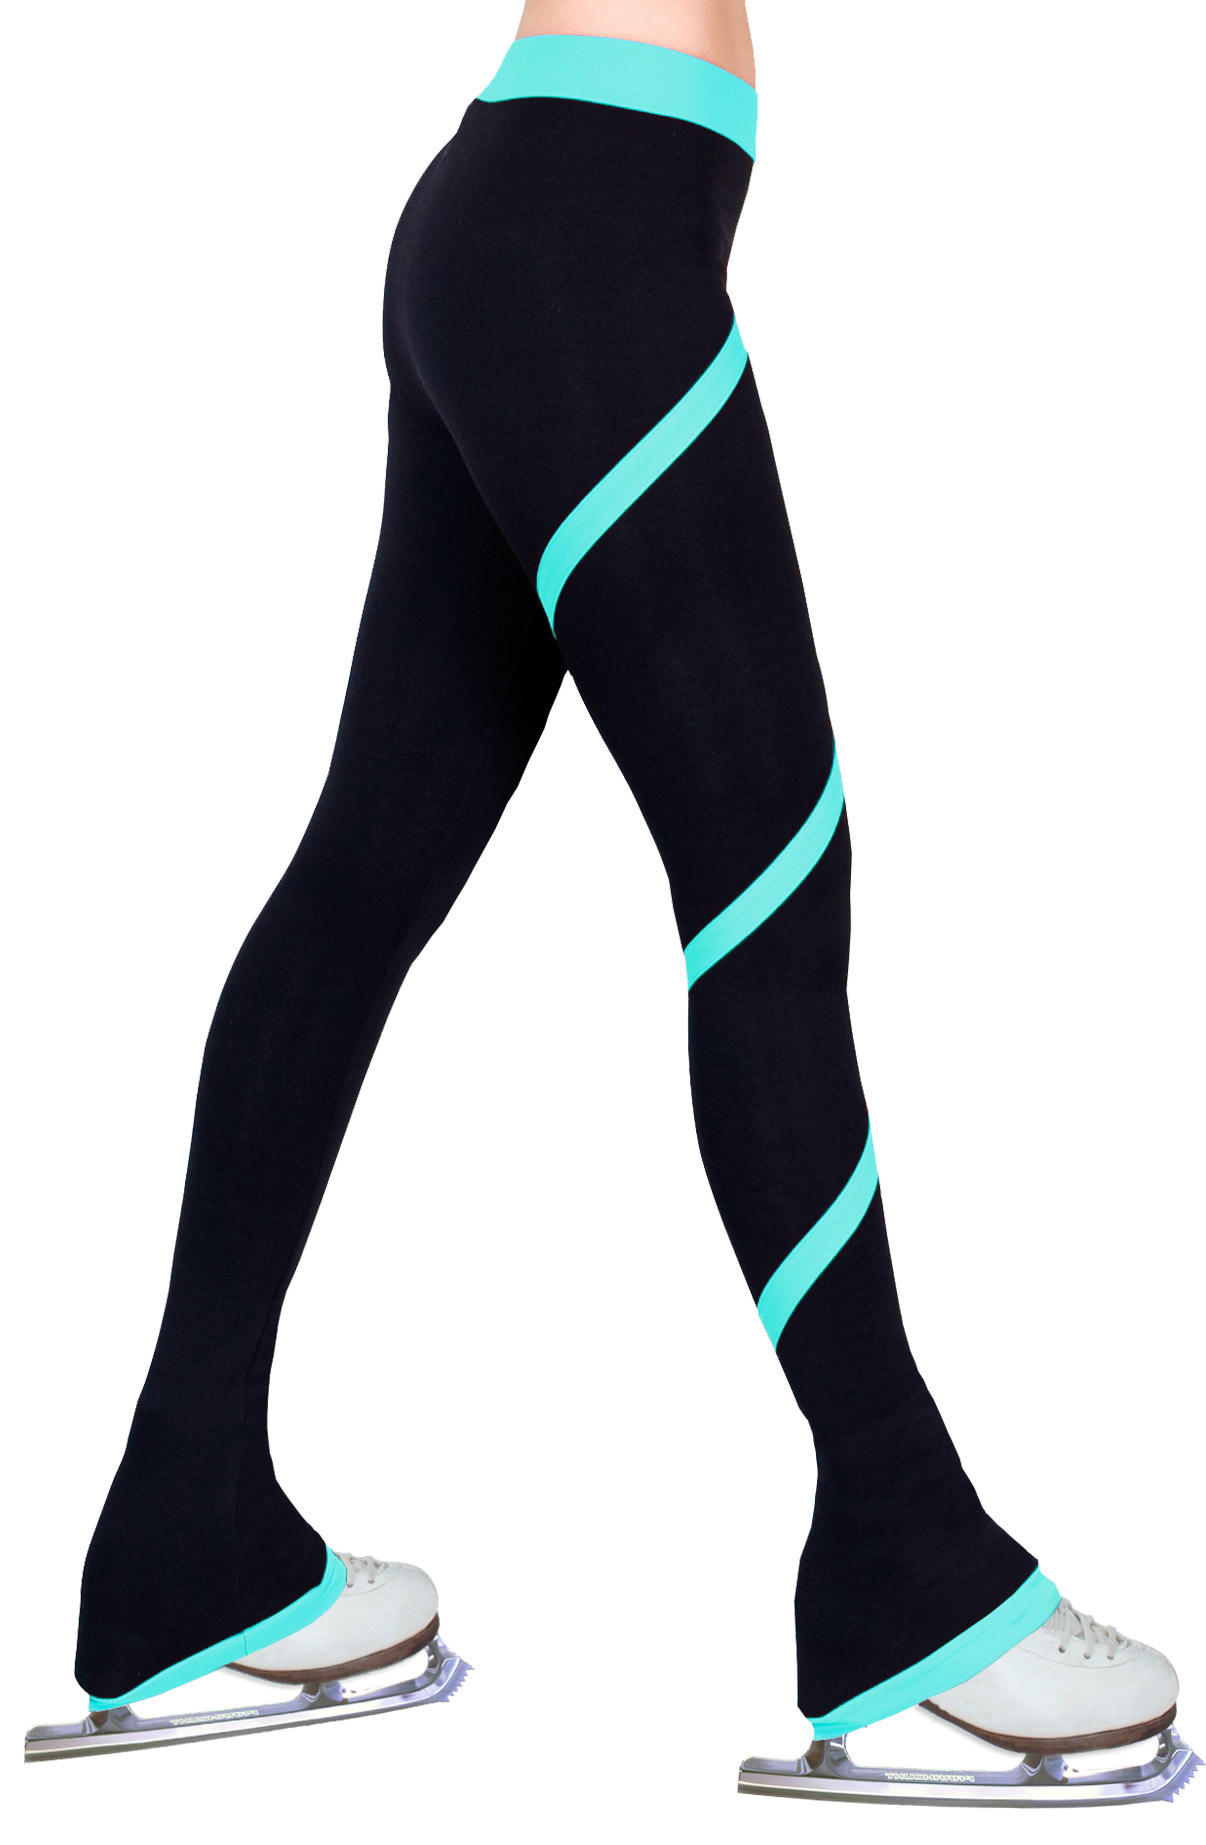 Ice Figure Skating Dress Pants Yoga Pants Warm Fleece Polartec UniqGarb VC